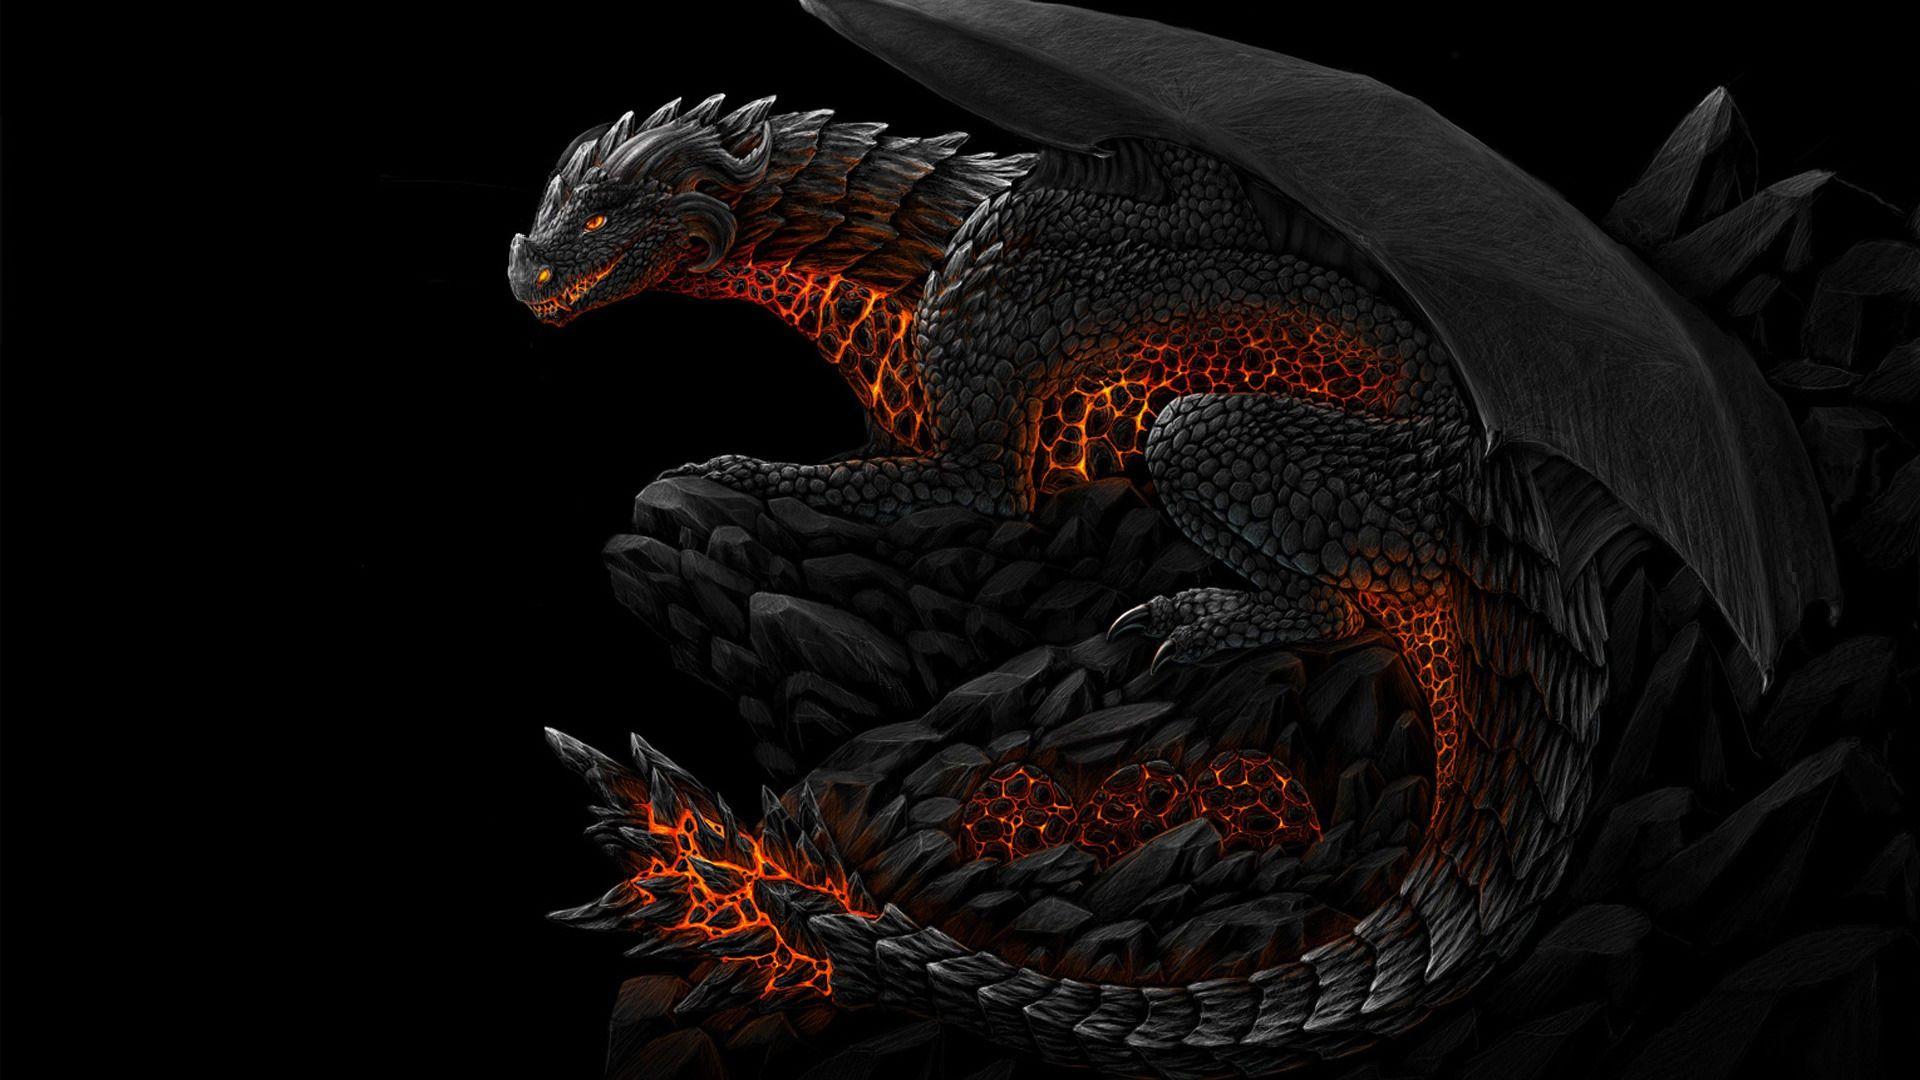 dragon 1920x1080